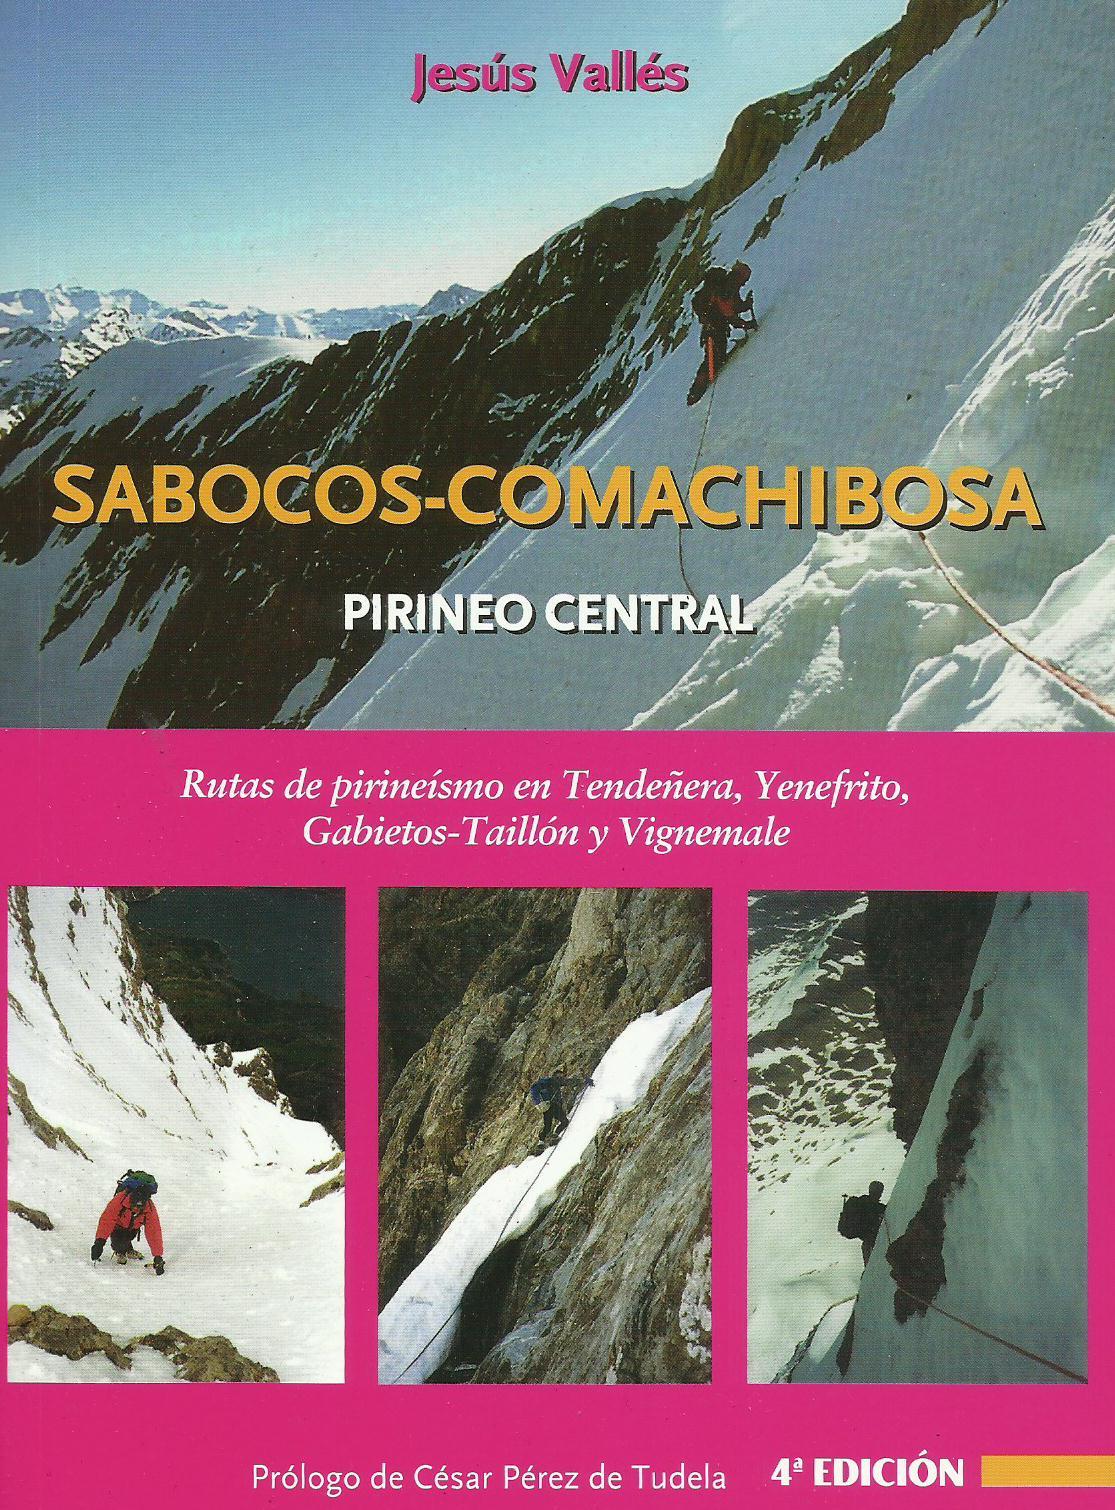 SABOCOS-COMACHIBOSA 4ª EDICIÓN